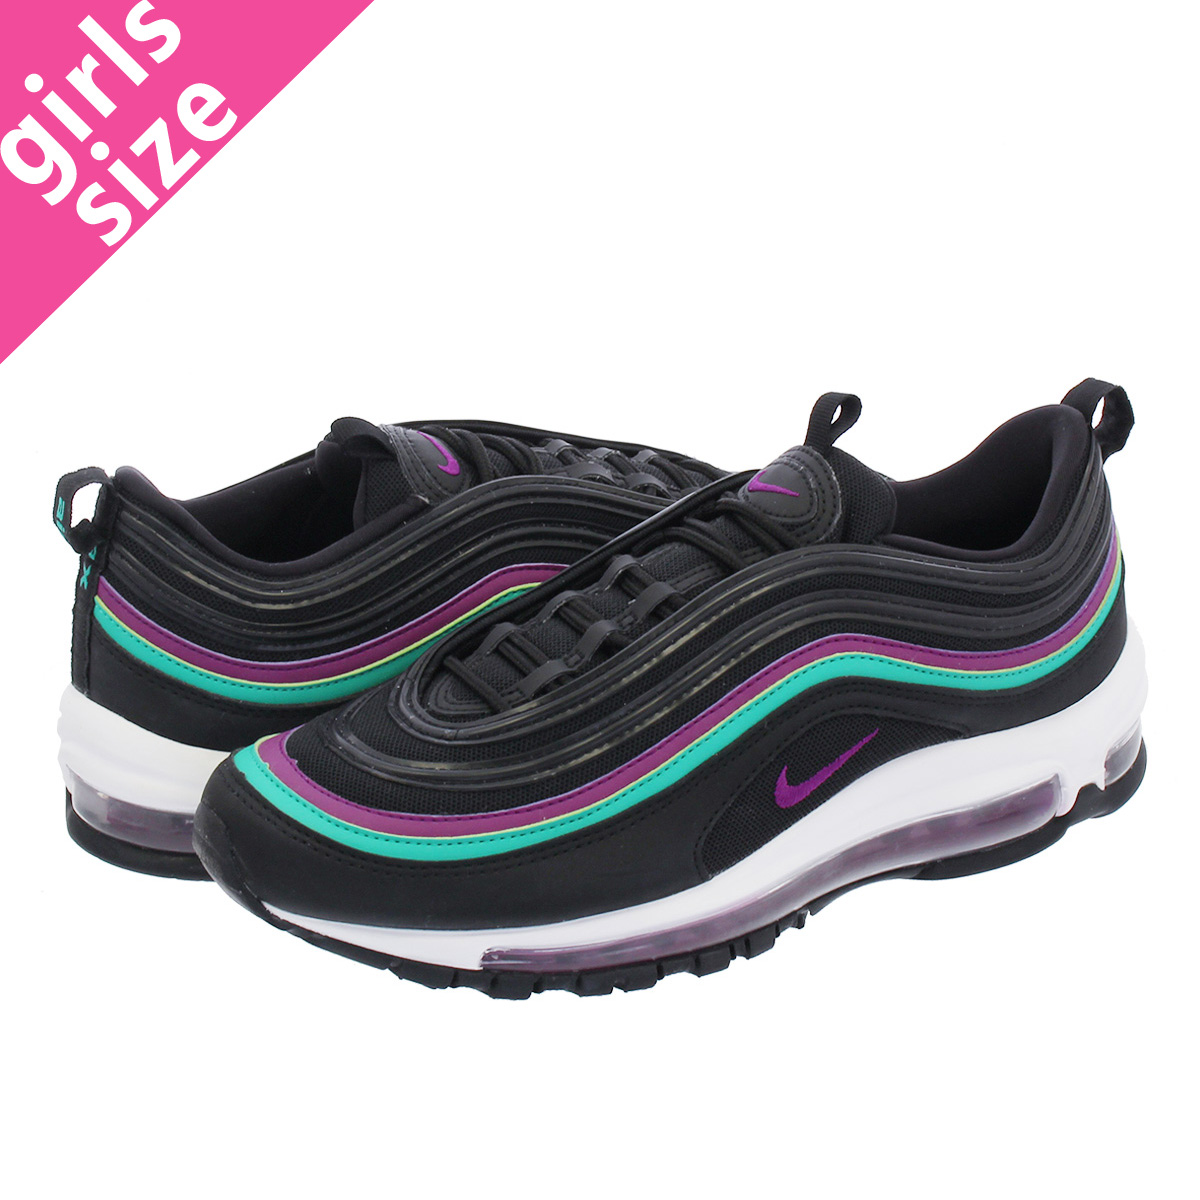 reputable site 03d8c 337d0 LOWTEX BIG-SMALL SHOP NIKE WMNS AIR MAX 97 Nike women Air Max 97  BLACKBRIGHT GRAPECLEAR EMERALD 921,733-008  Rakuten Global Market